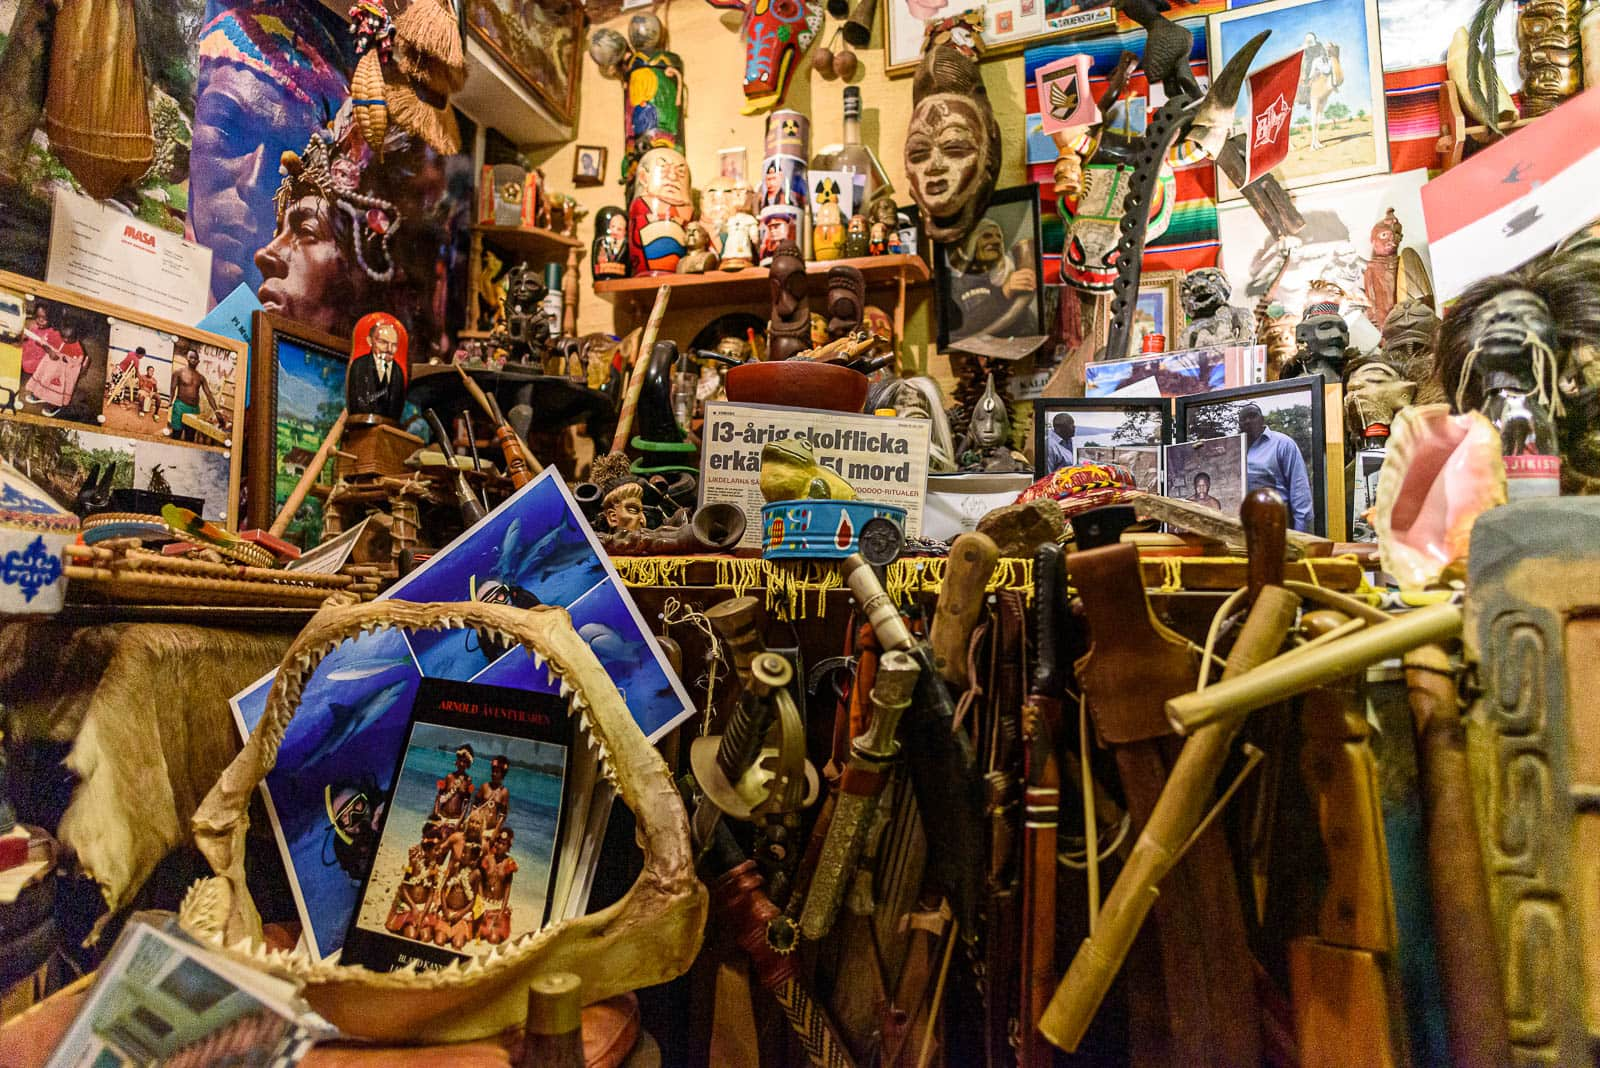 Arnolds Kannibalmuseum